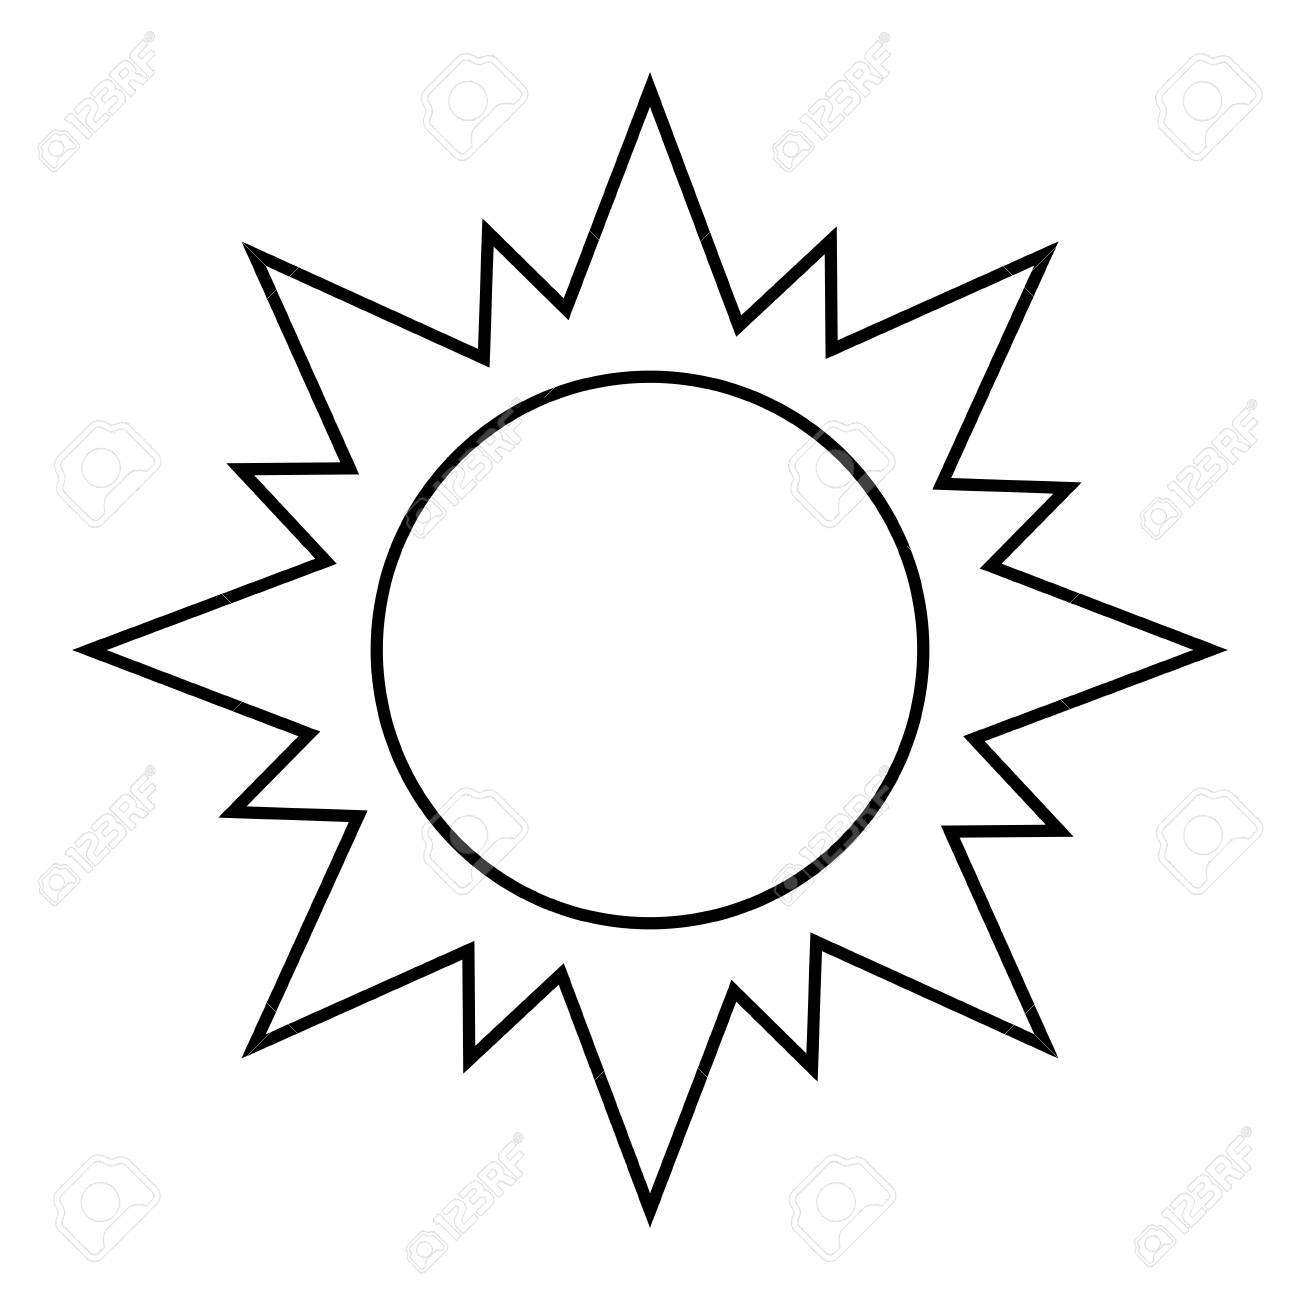 sun silhouette illustration vector design graphic icon royalty free rh 123rf com Dolphin Silhouette Vector Sun Design Vector